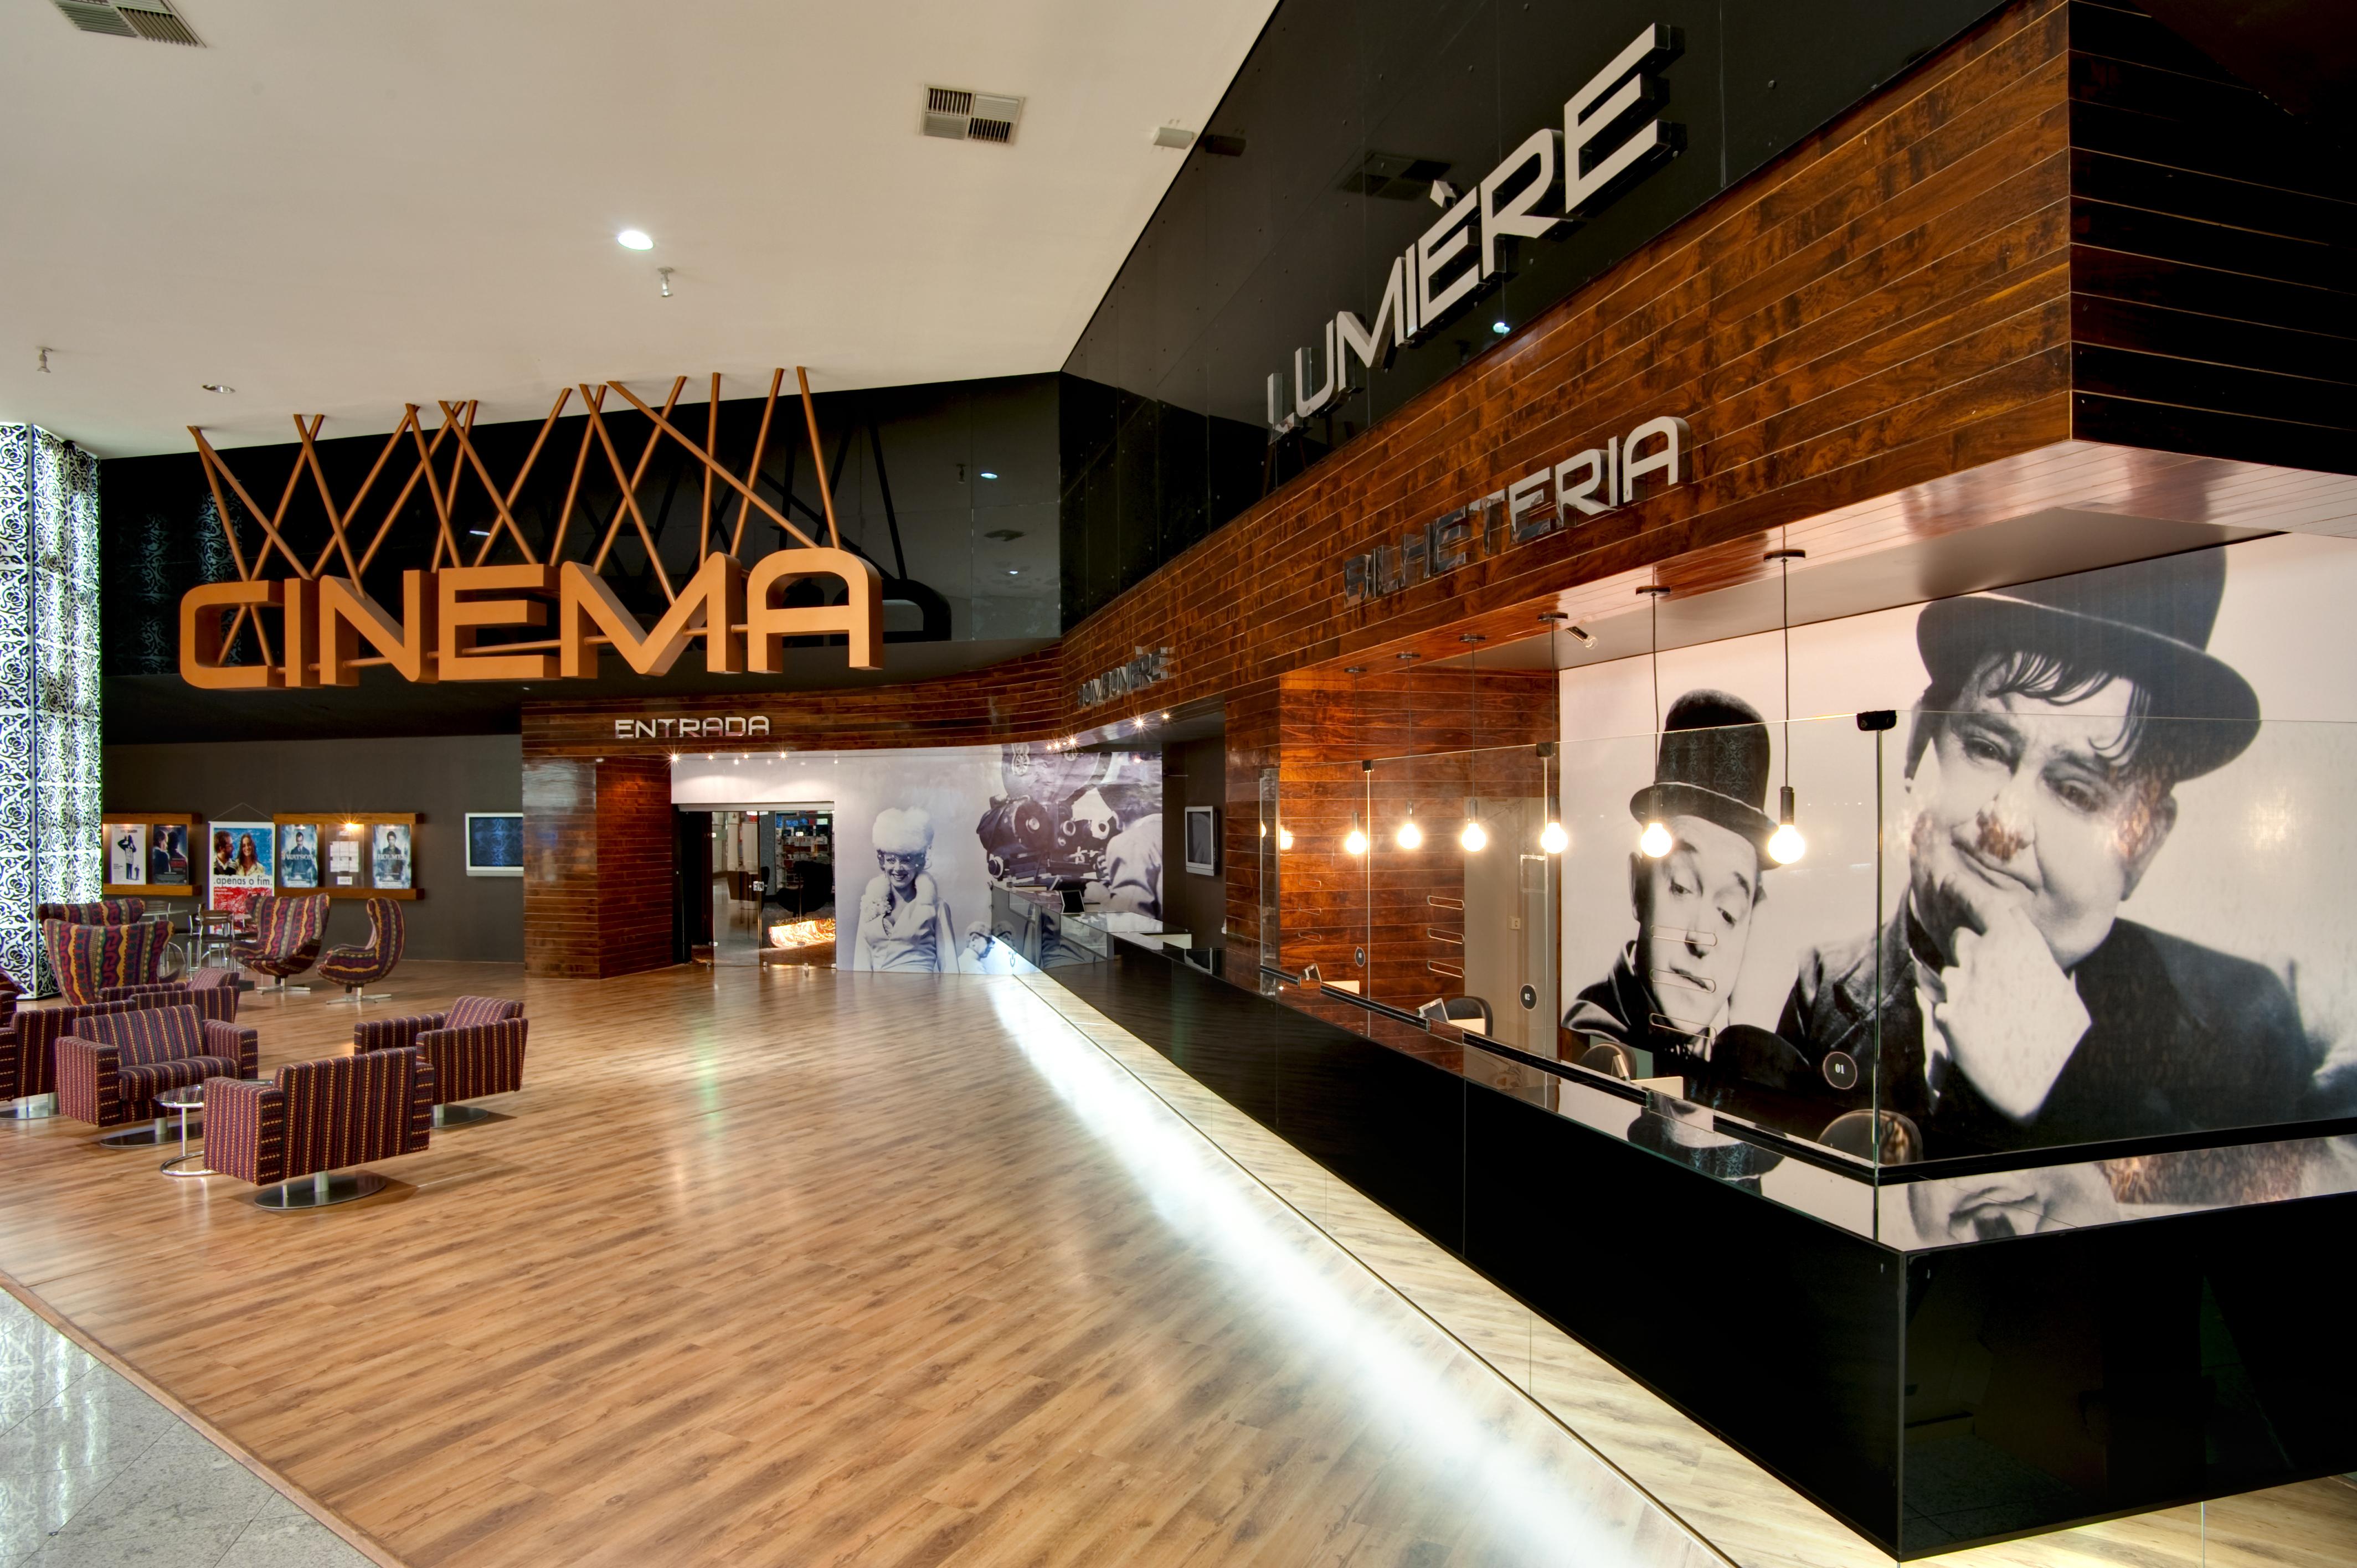 Cinema Lumiere Bougainville / Dayala + Rafael Arquitetura, © Leandro Moura estúdio onzeonze